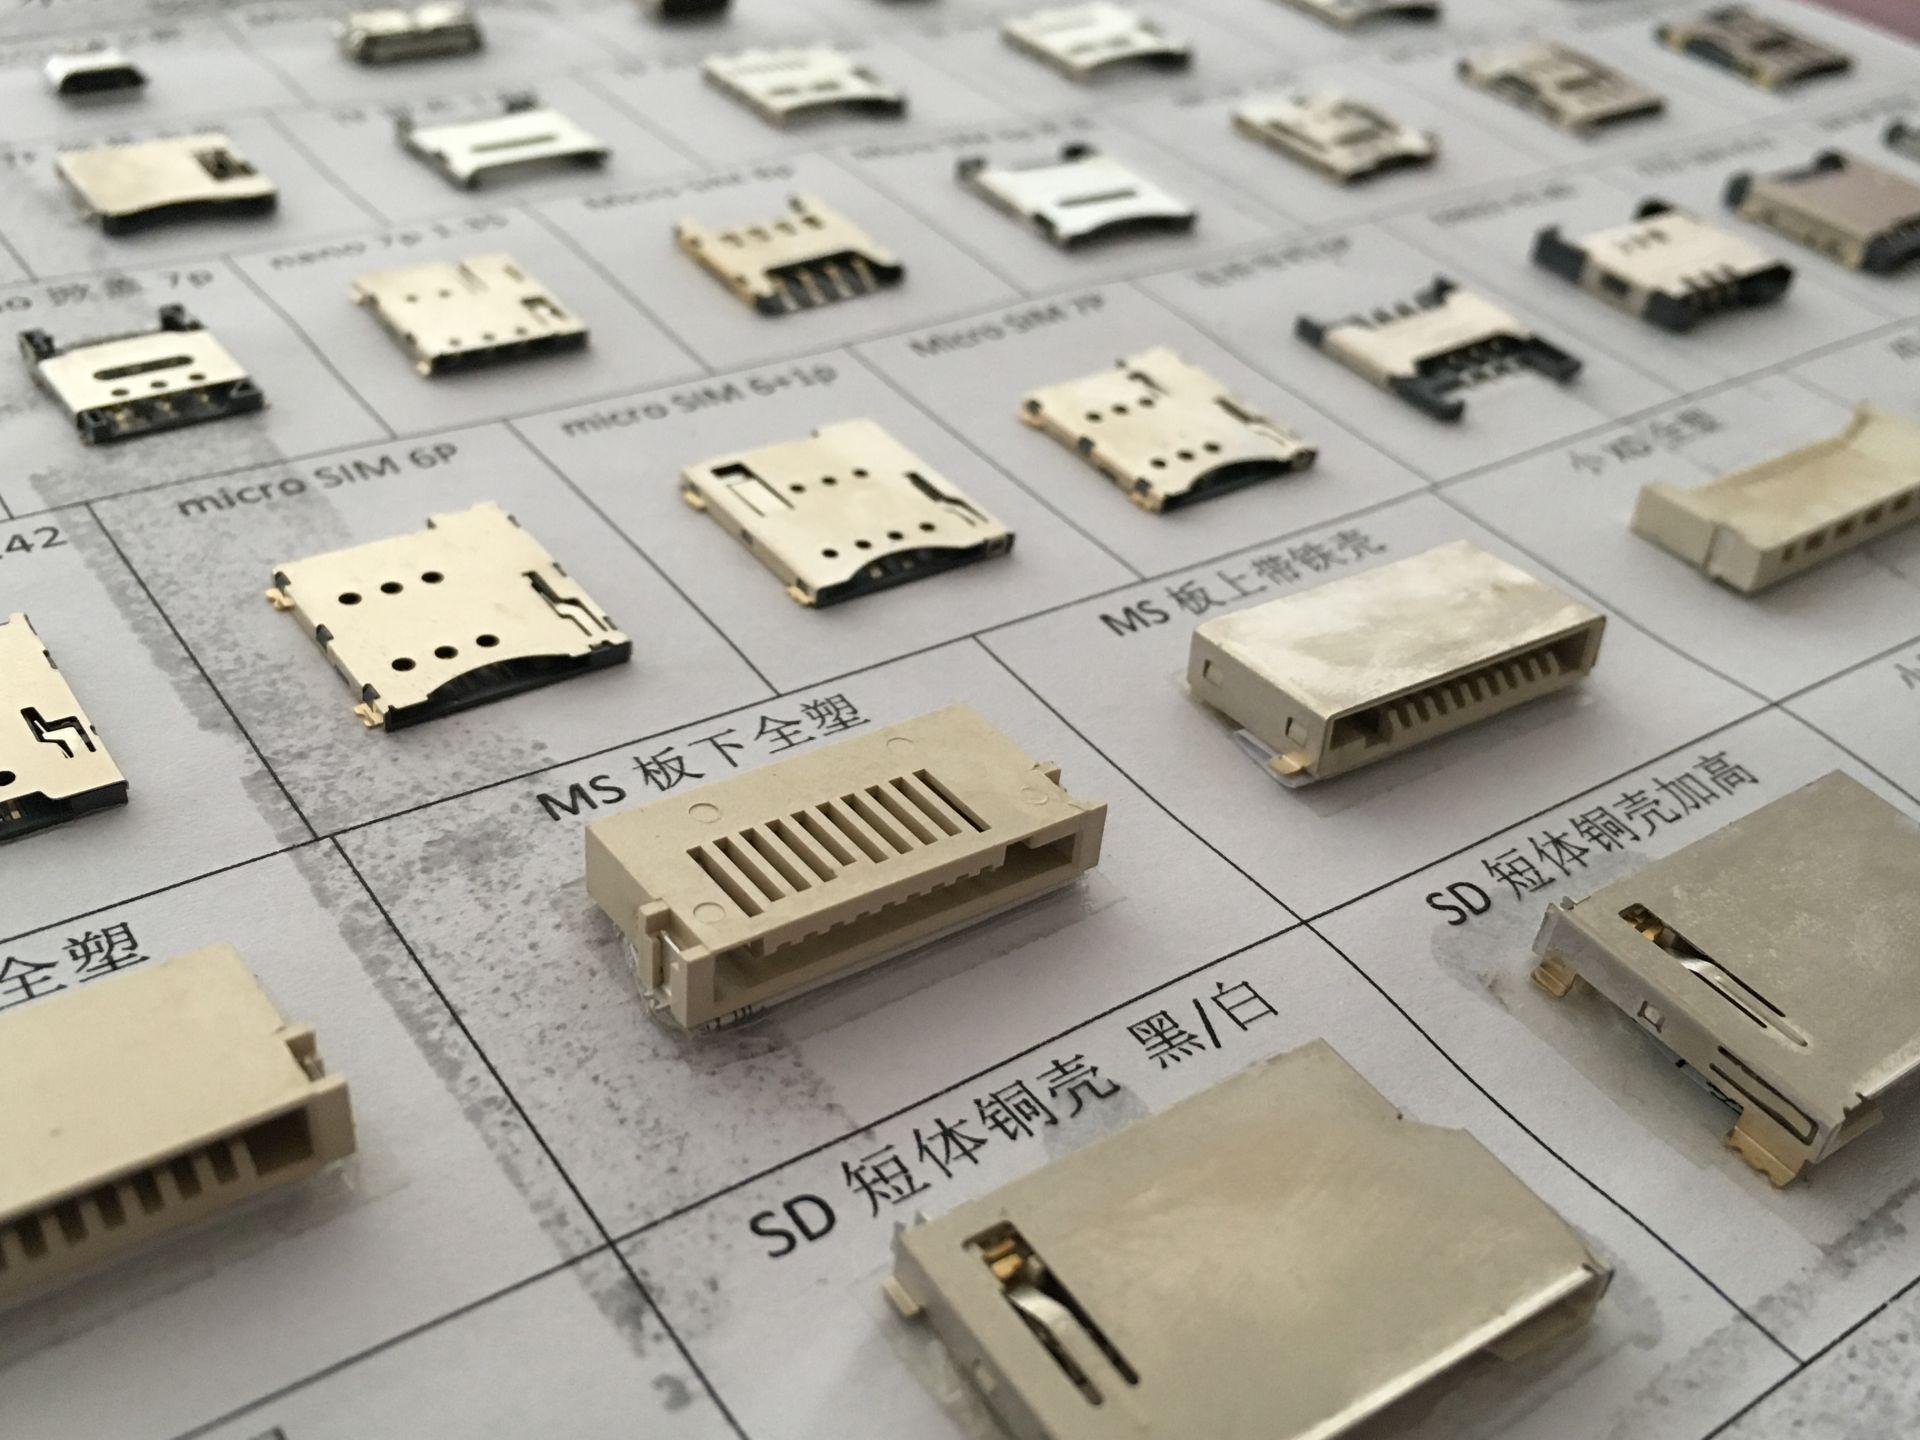 Wires、Connectors、Card Connectors、USB series card